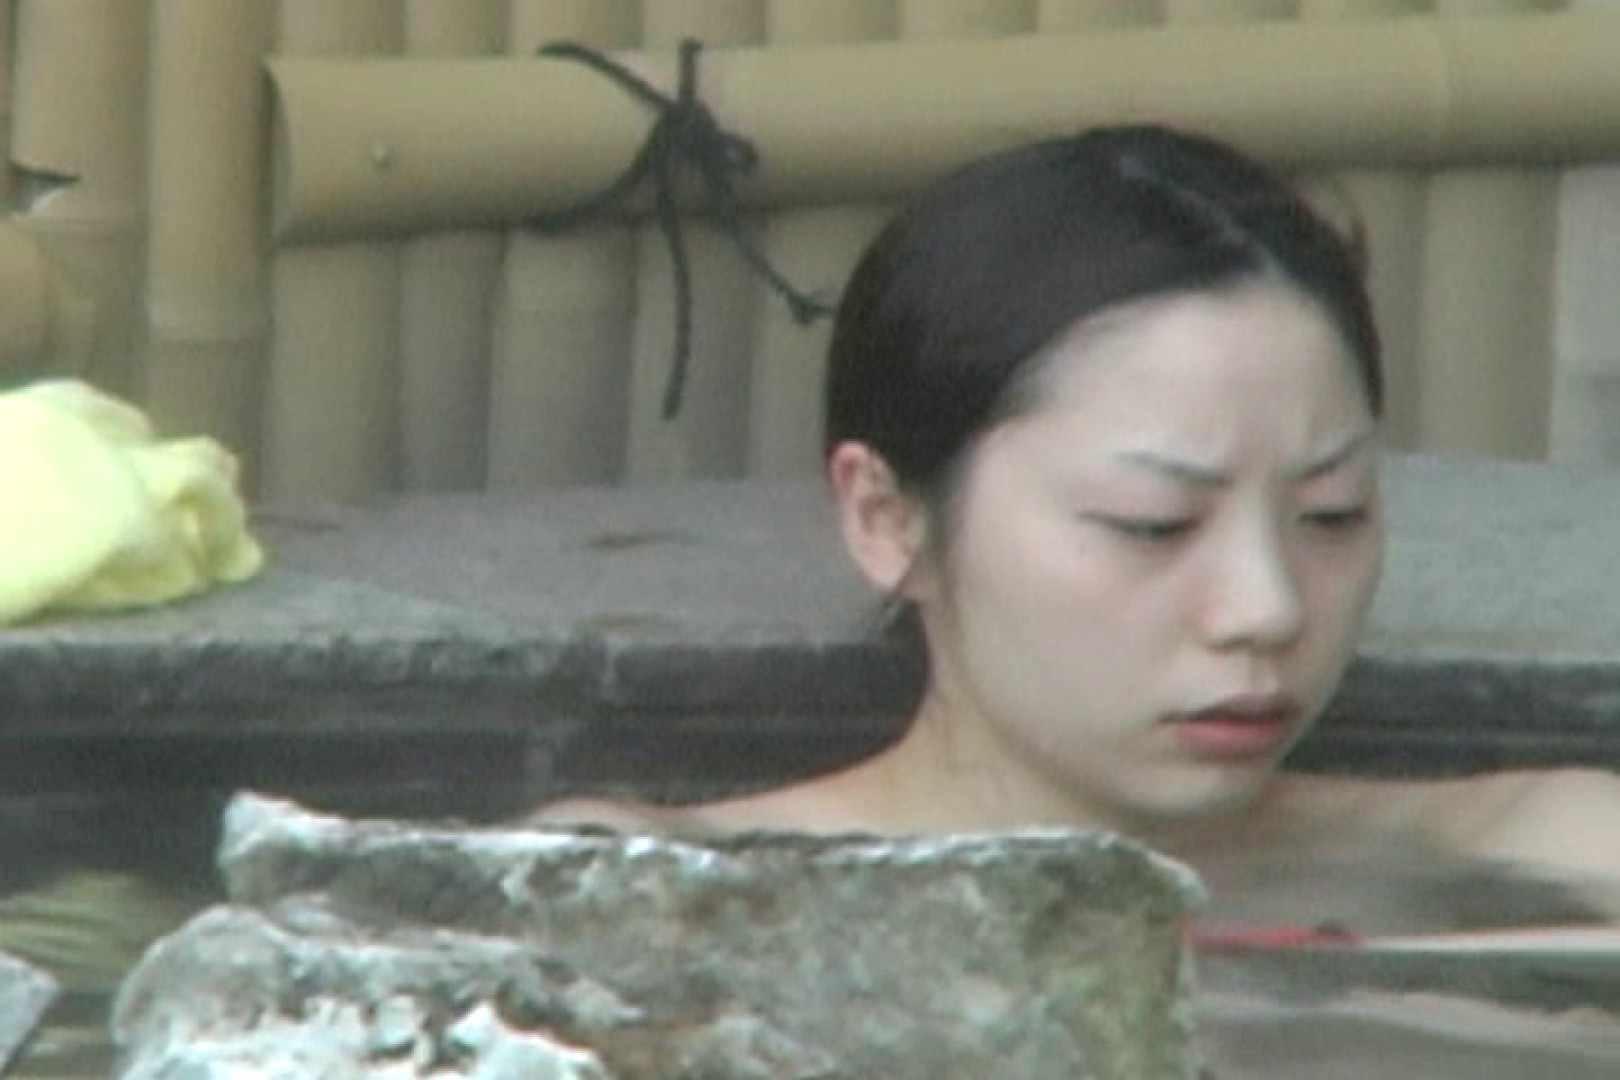 Aquaな露天風呂Vol.596 OLセックス  77画像 24